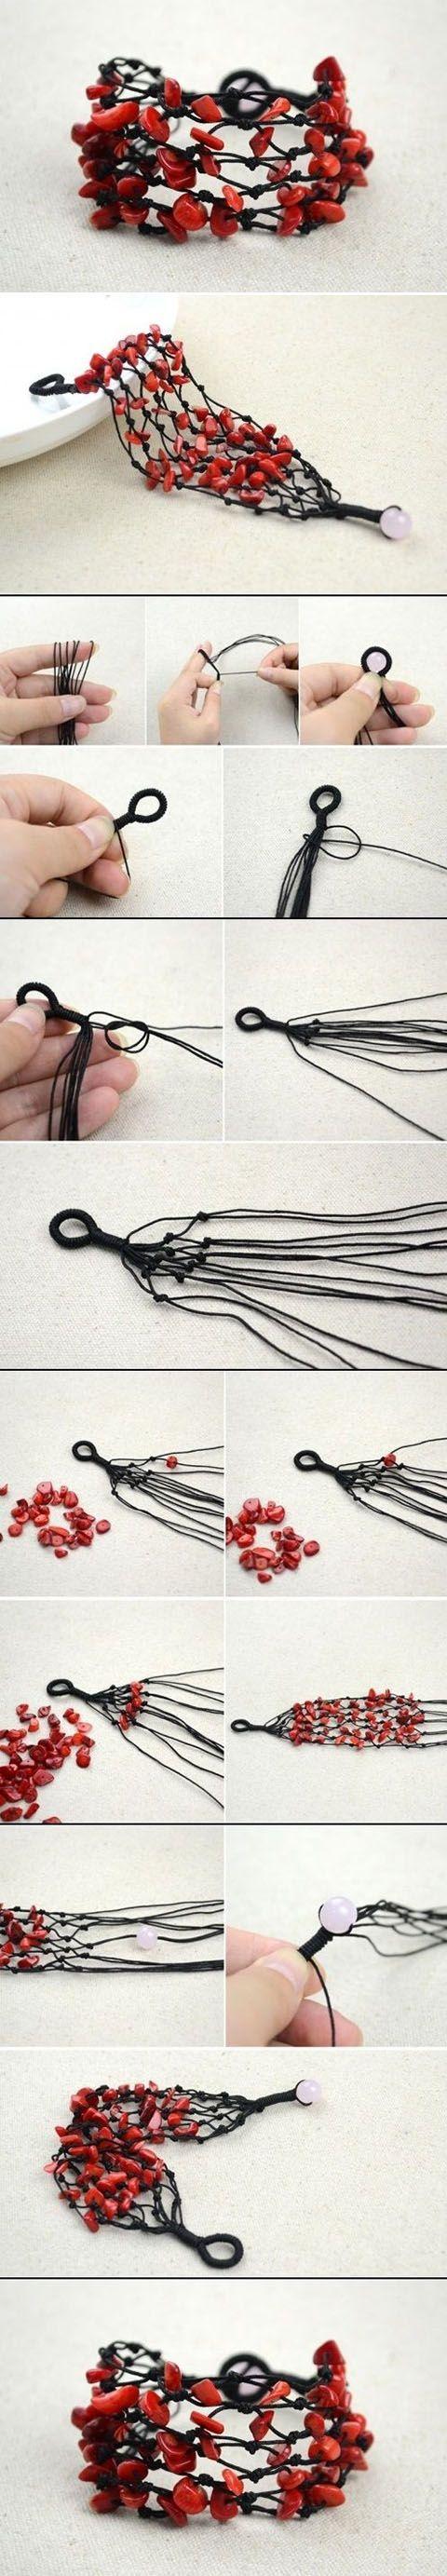 So Beautiful Bracelet | DIY & Crafts Tutorials